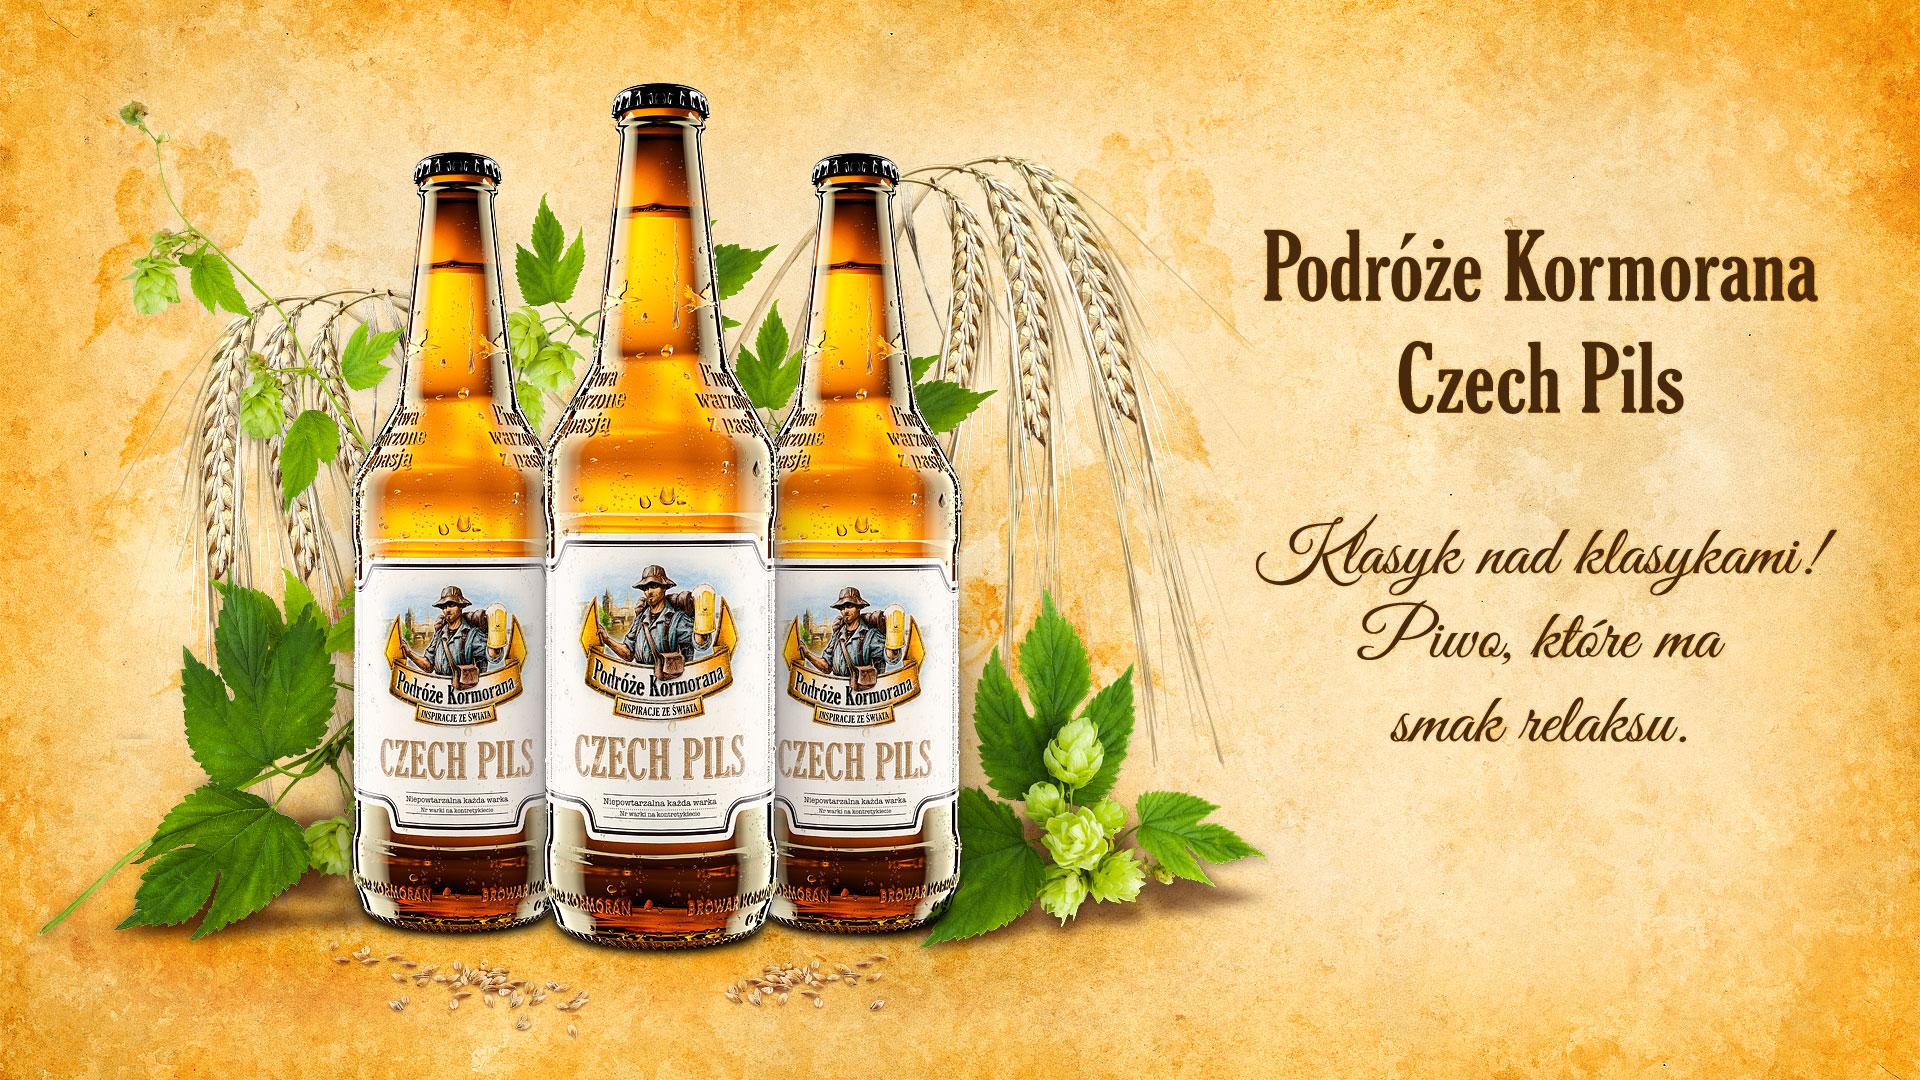 Piwo Podróże Kormorana Czech Pils - Browar Kormoran